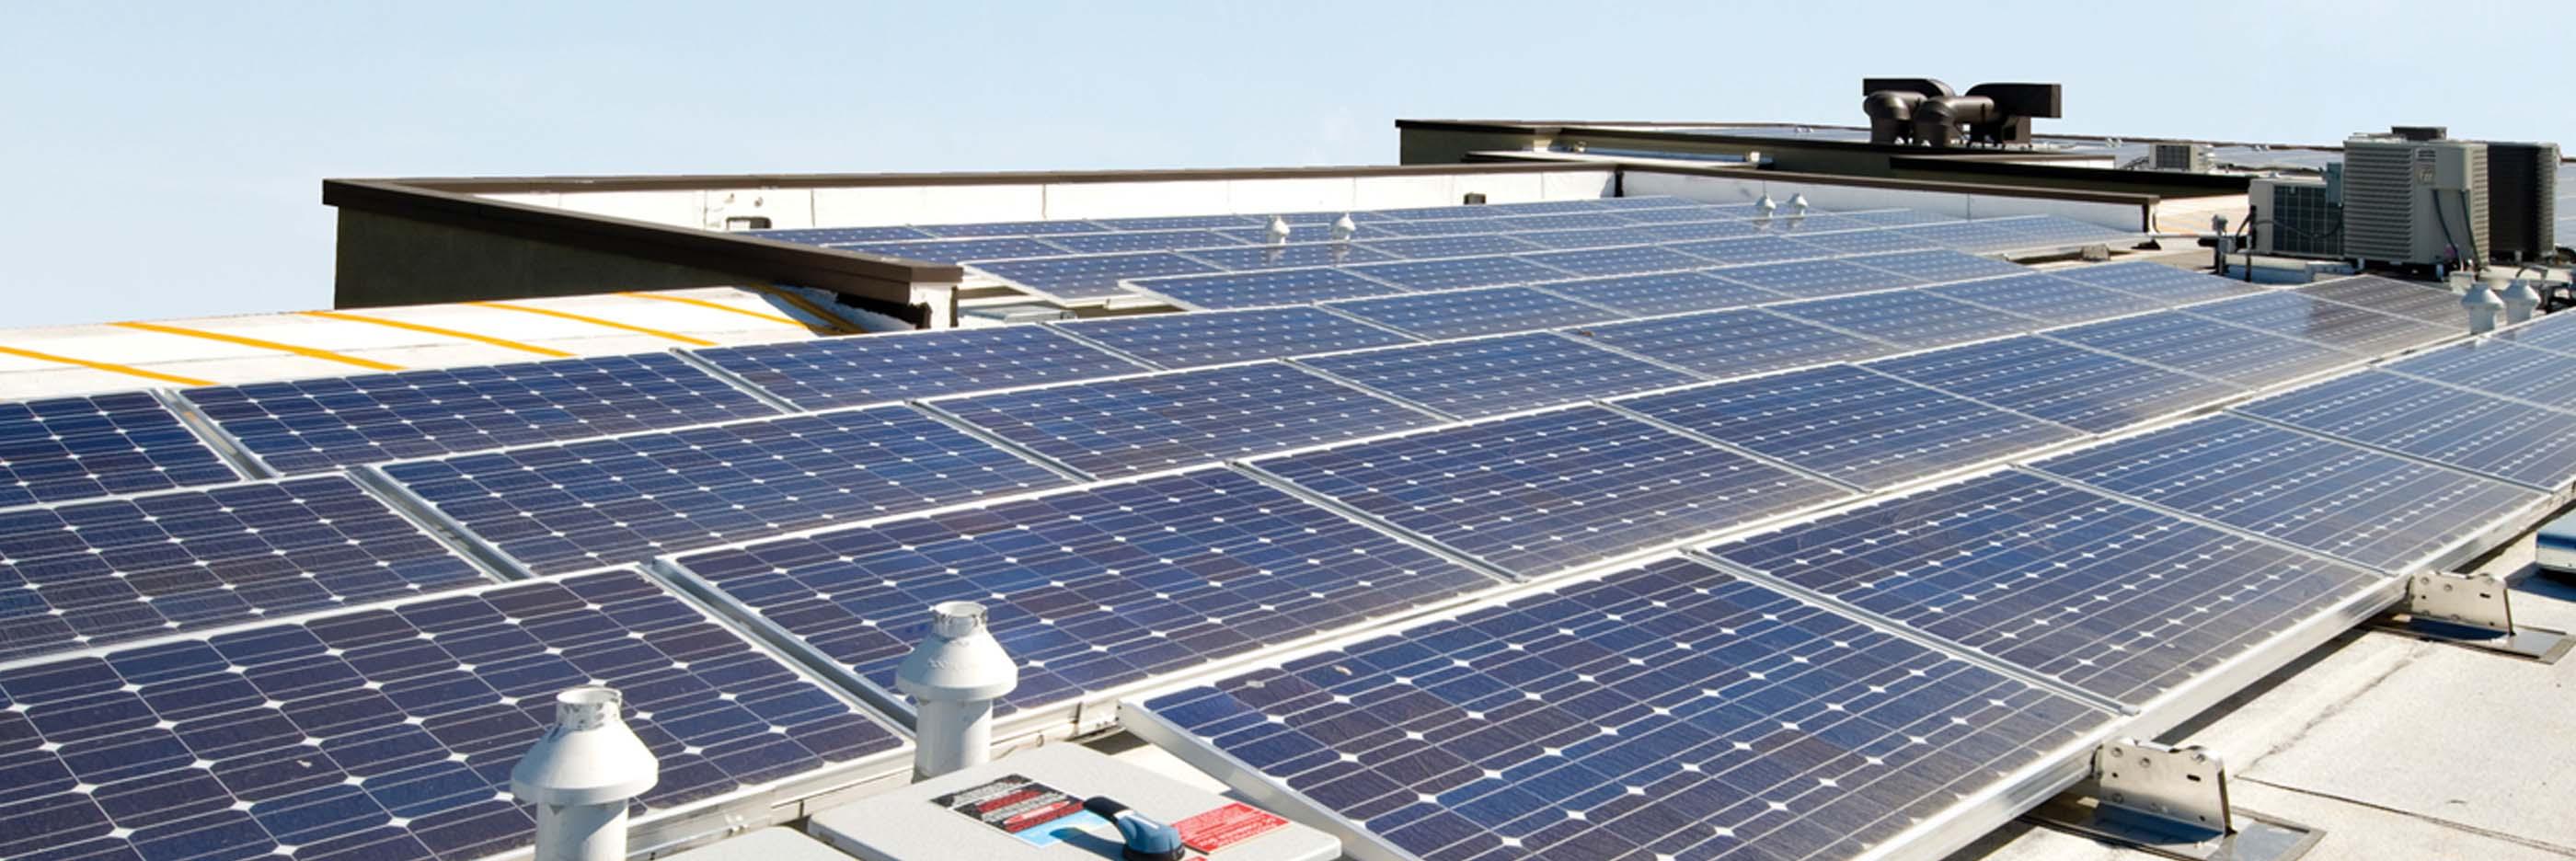 Commercial Solar Resized Large